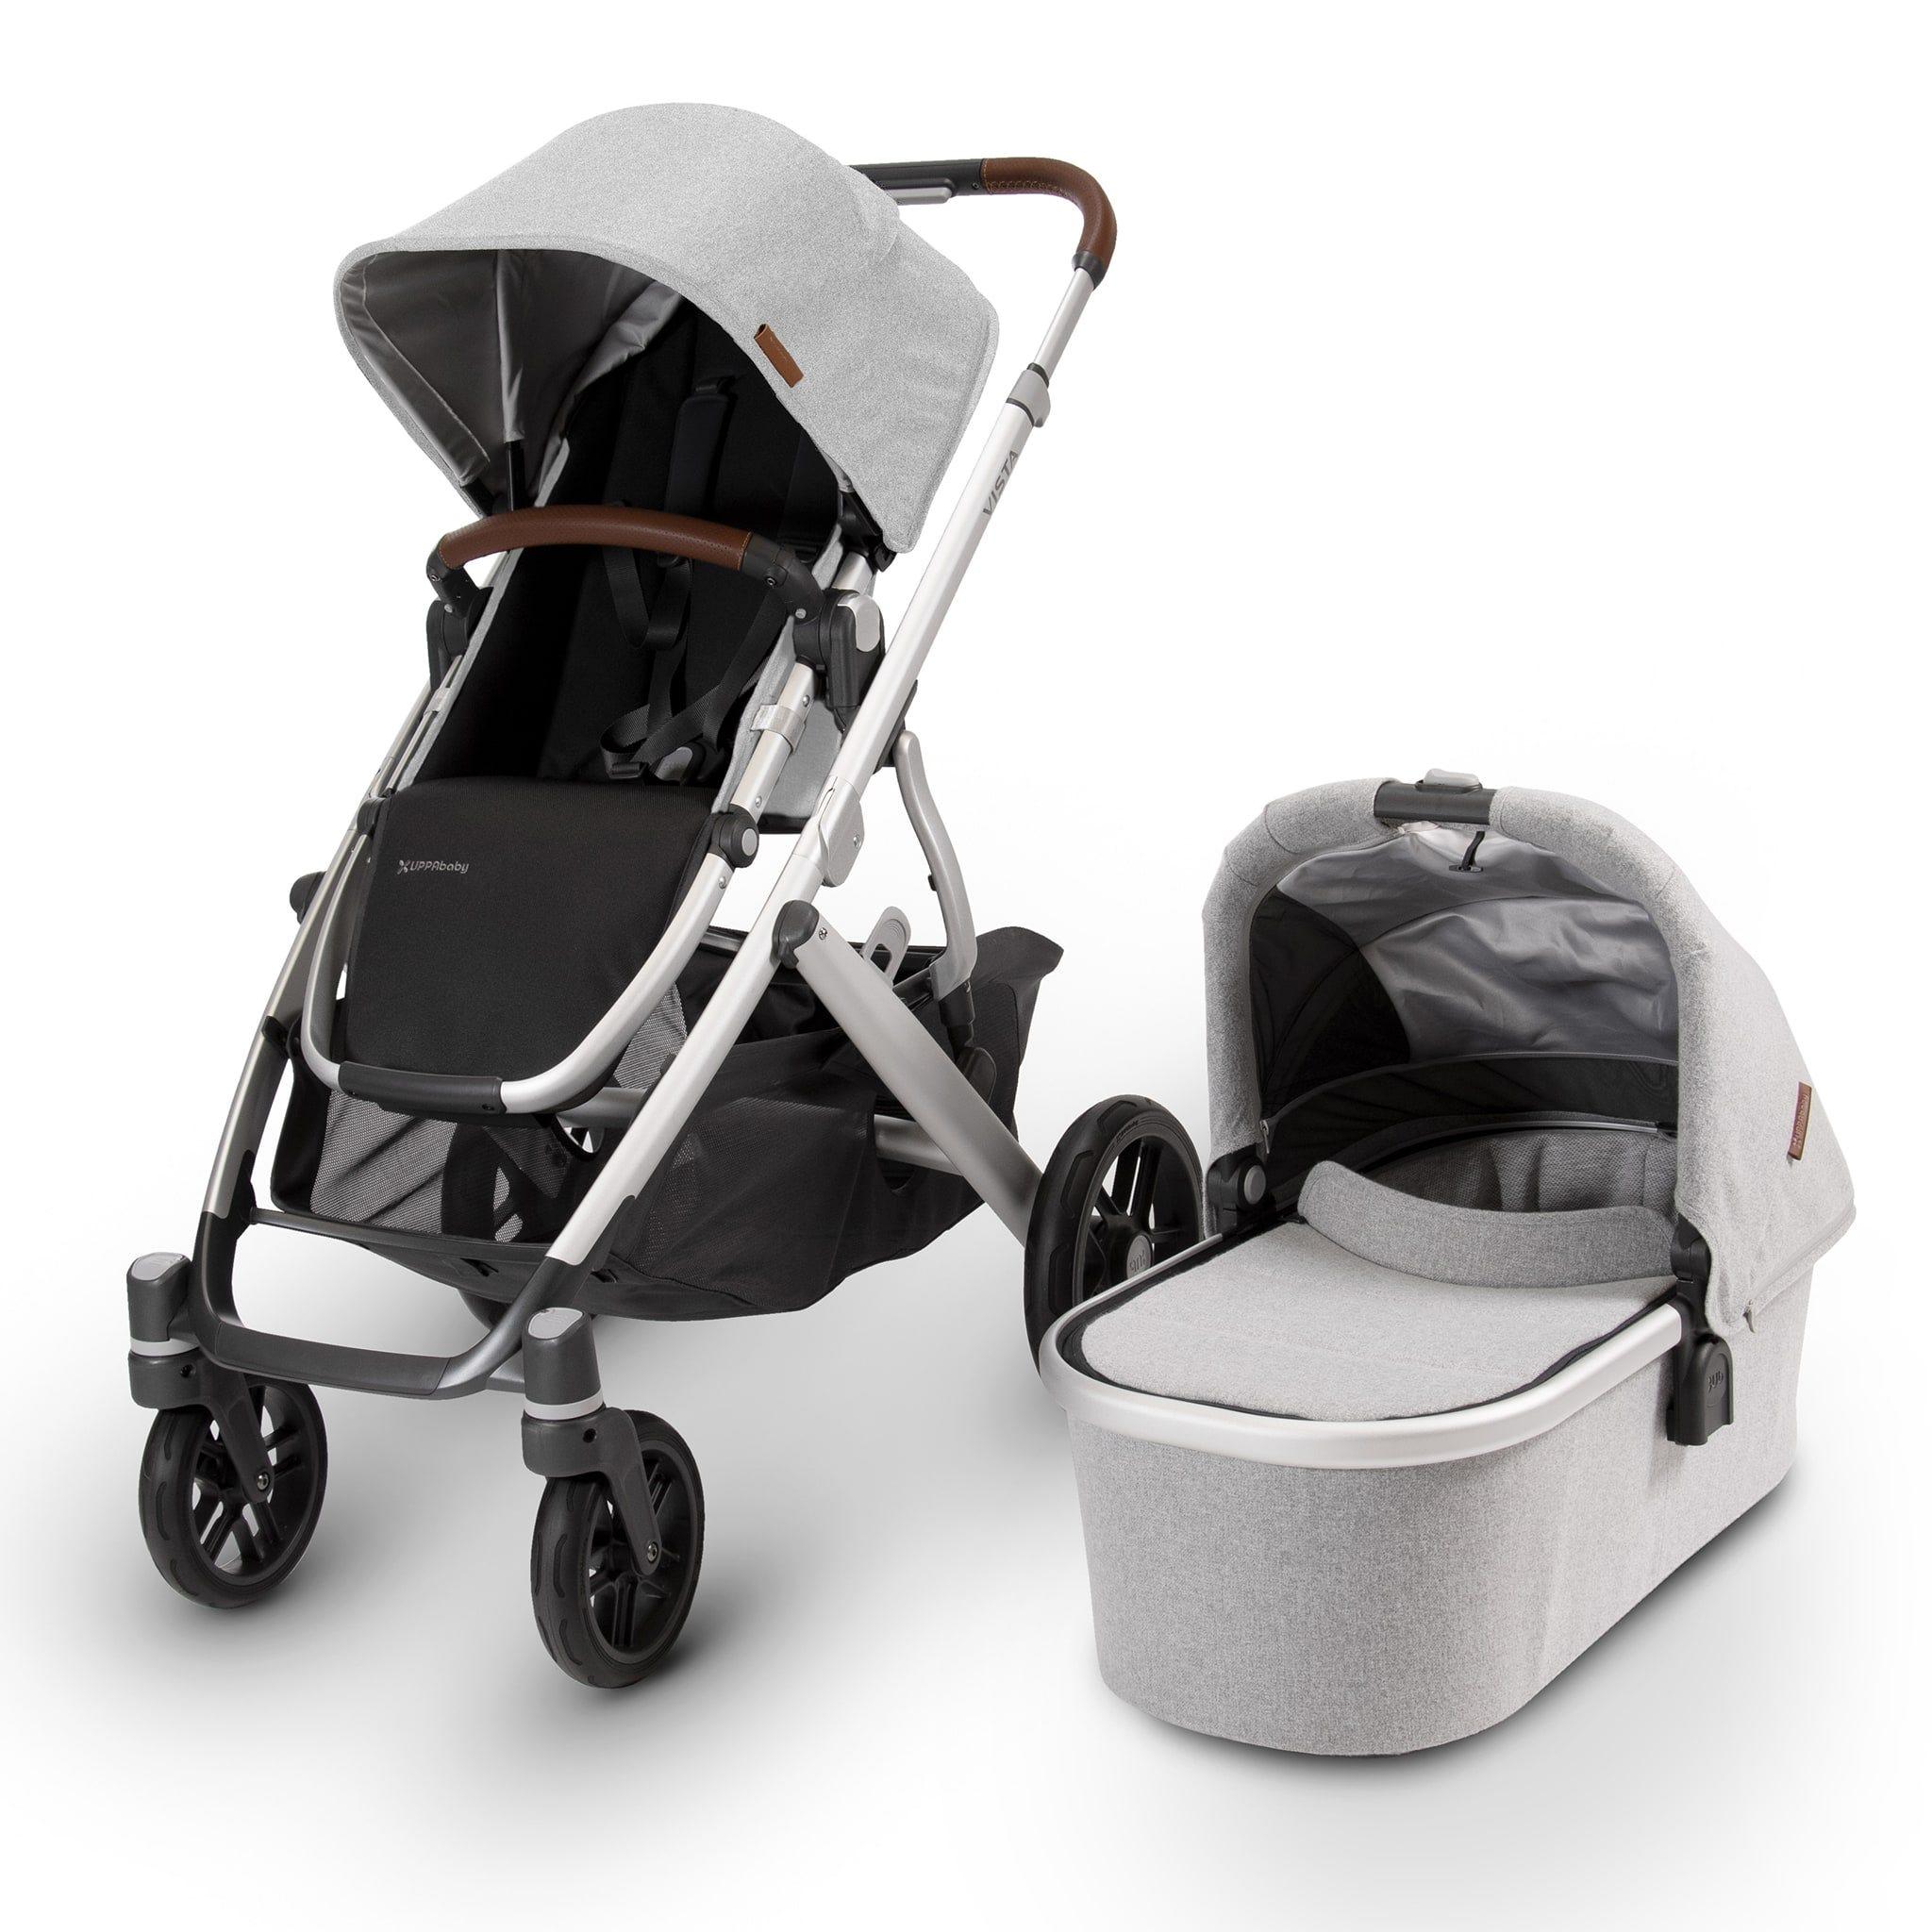 41++ Uppababy vista stroller canada sale ideas in 2021